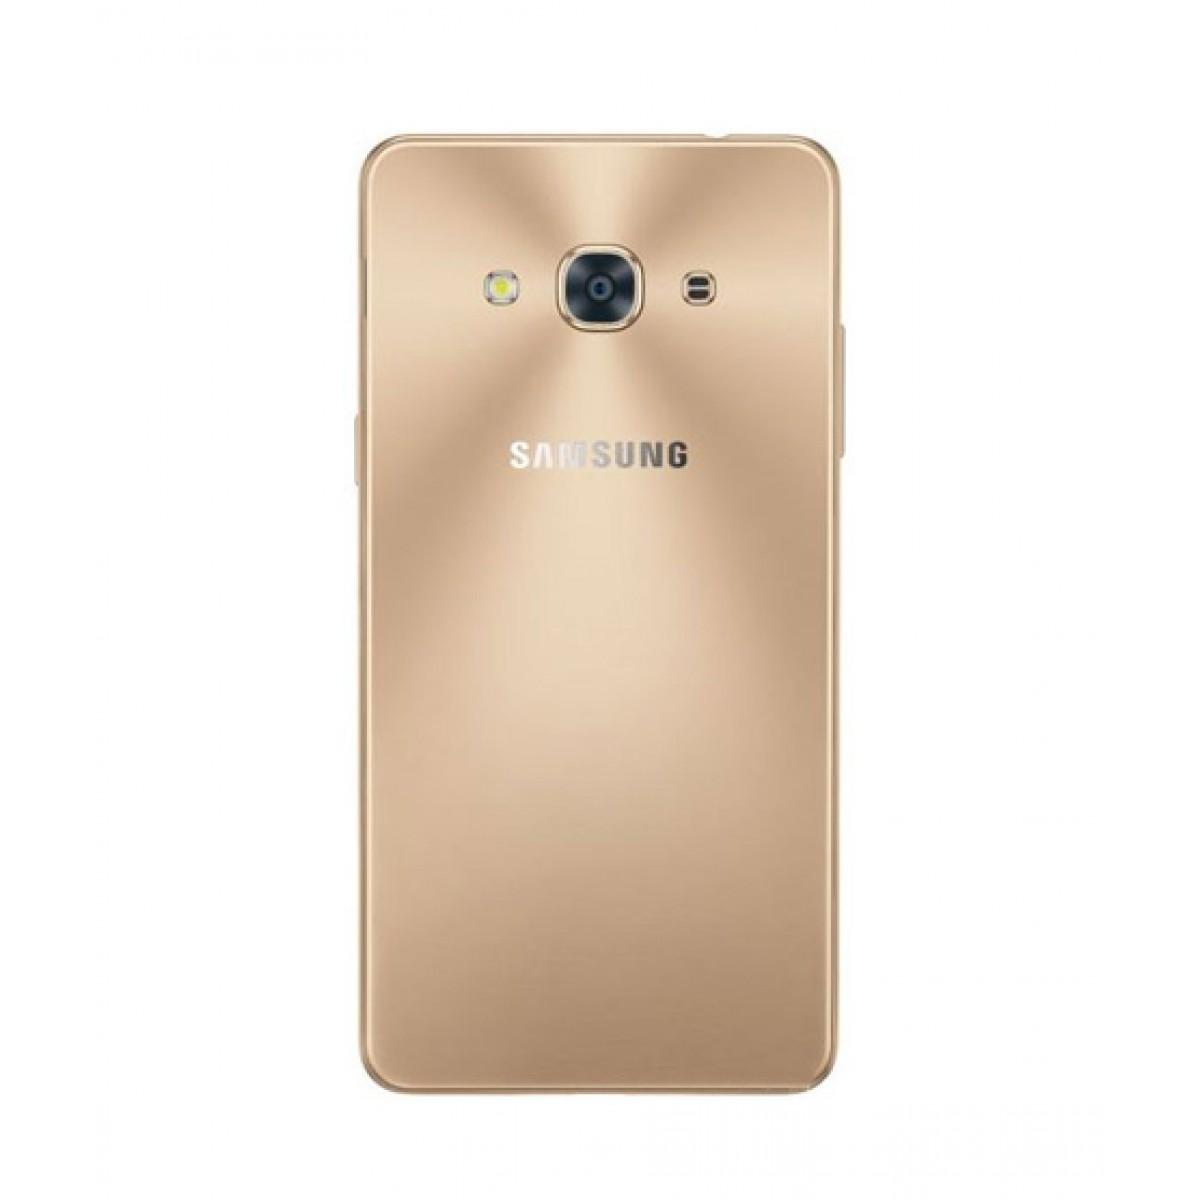 Samsung Galaxy J3 Pro 16GB Dual Sim Gold